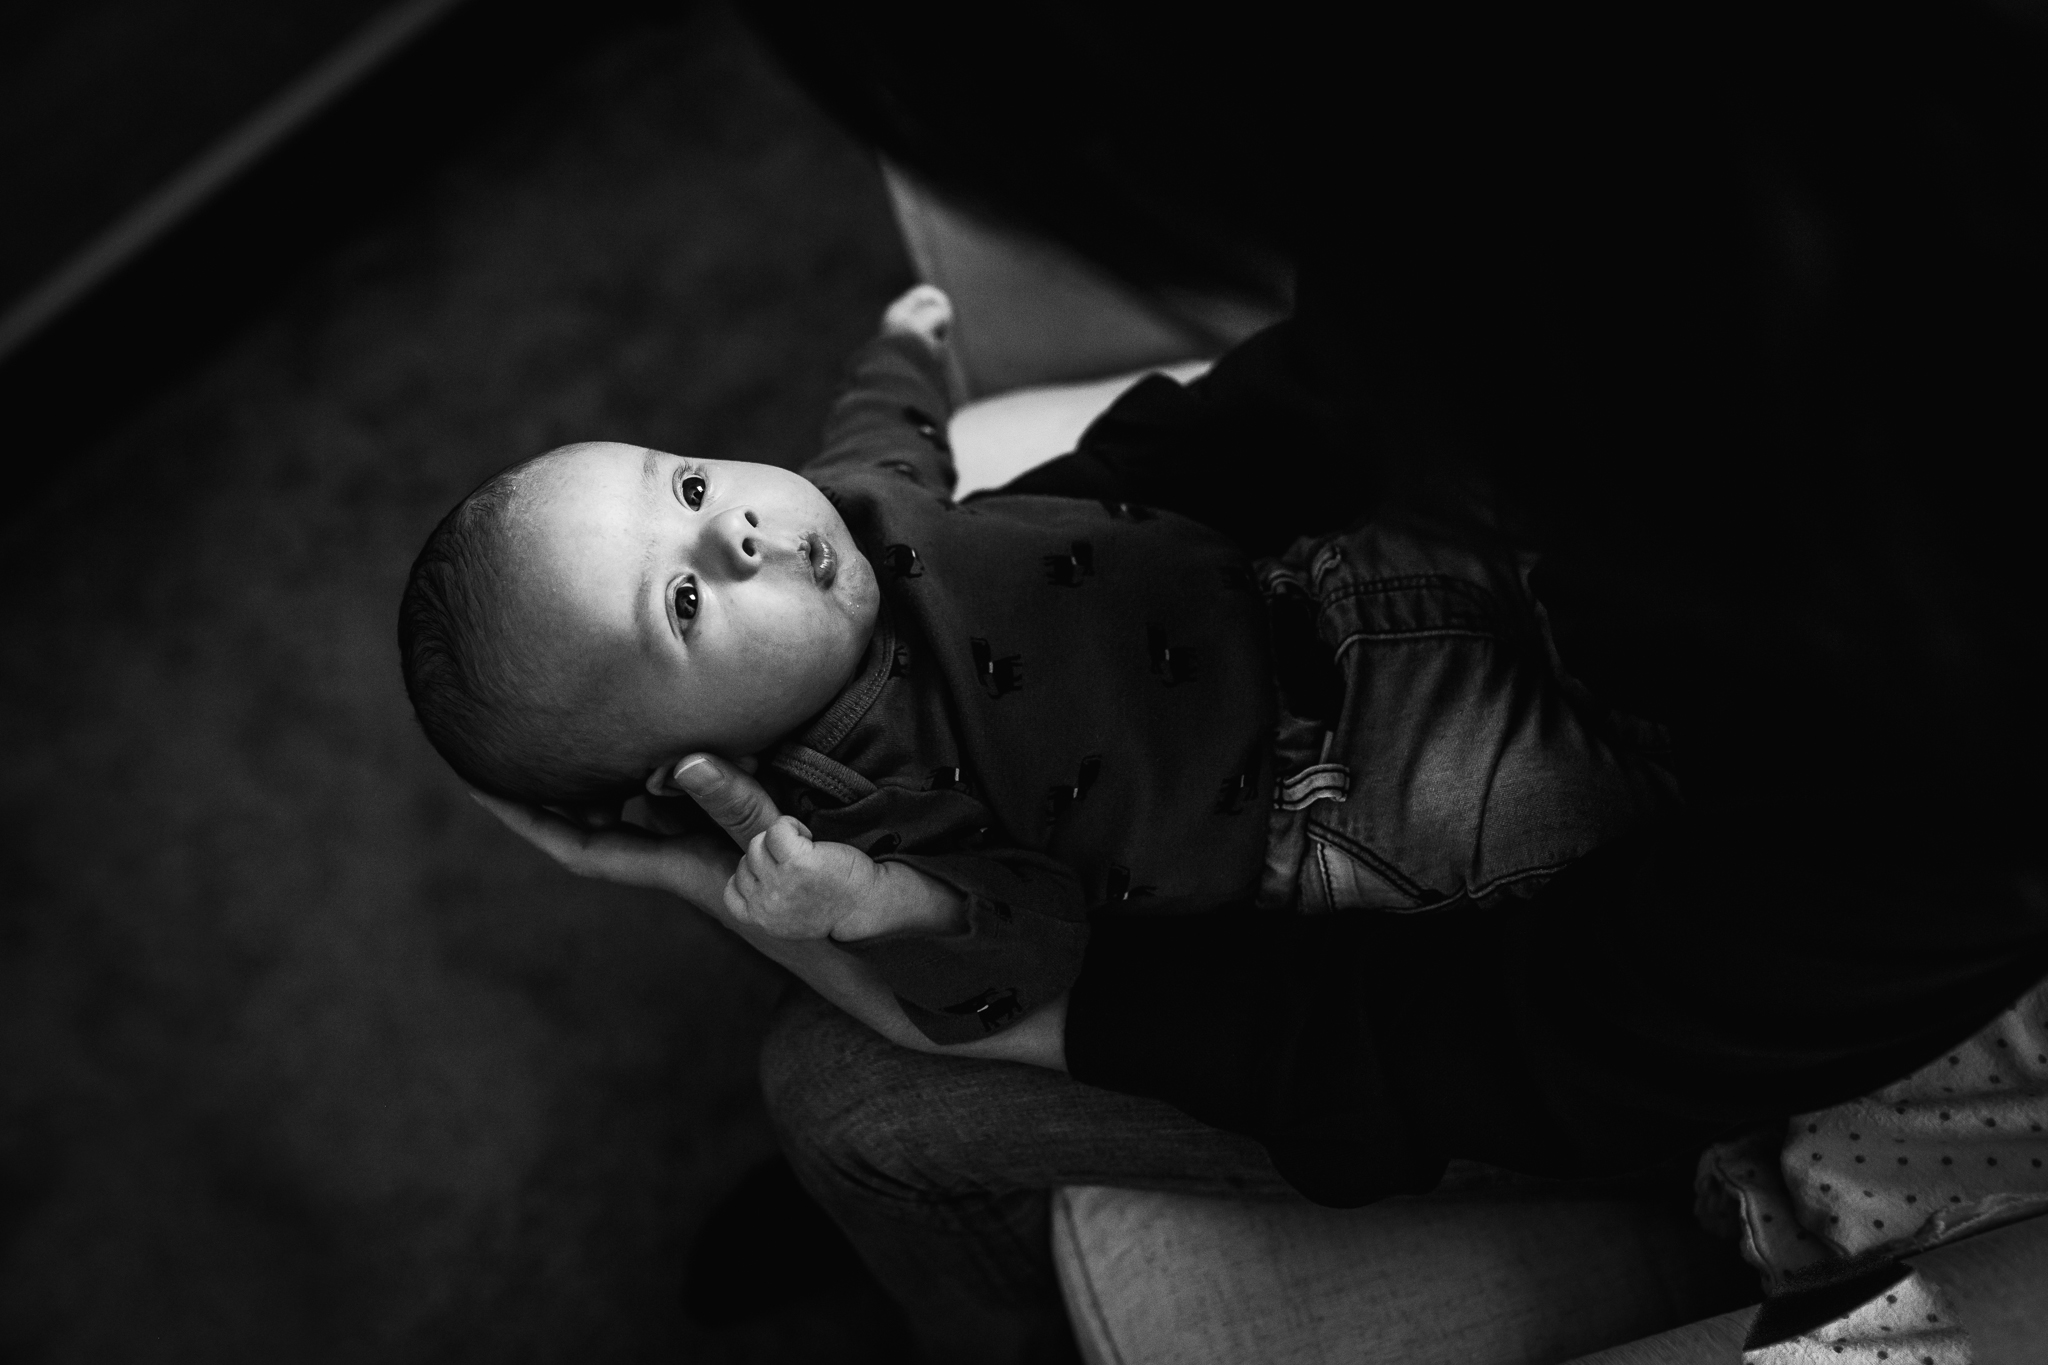 Alina-Joy-Photography-Cold-Lake-Photographer-3-8.jpg